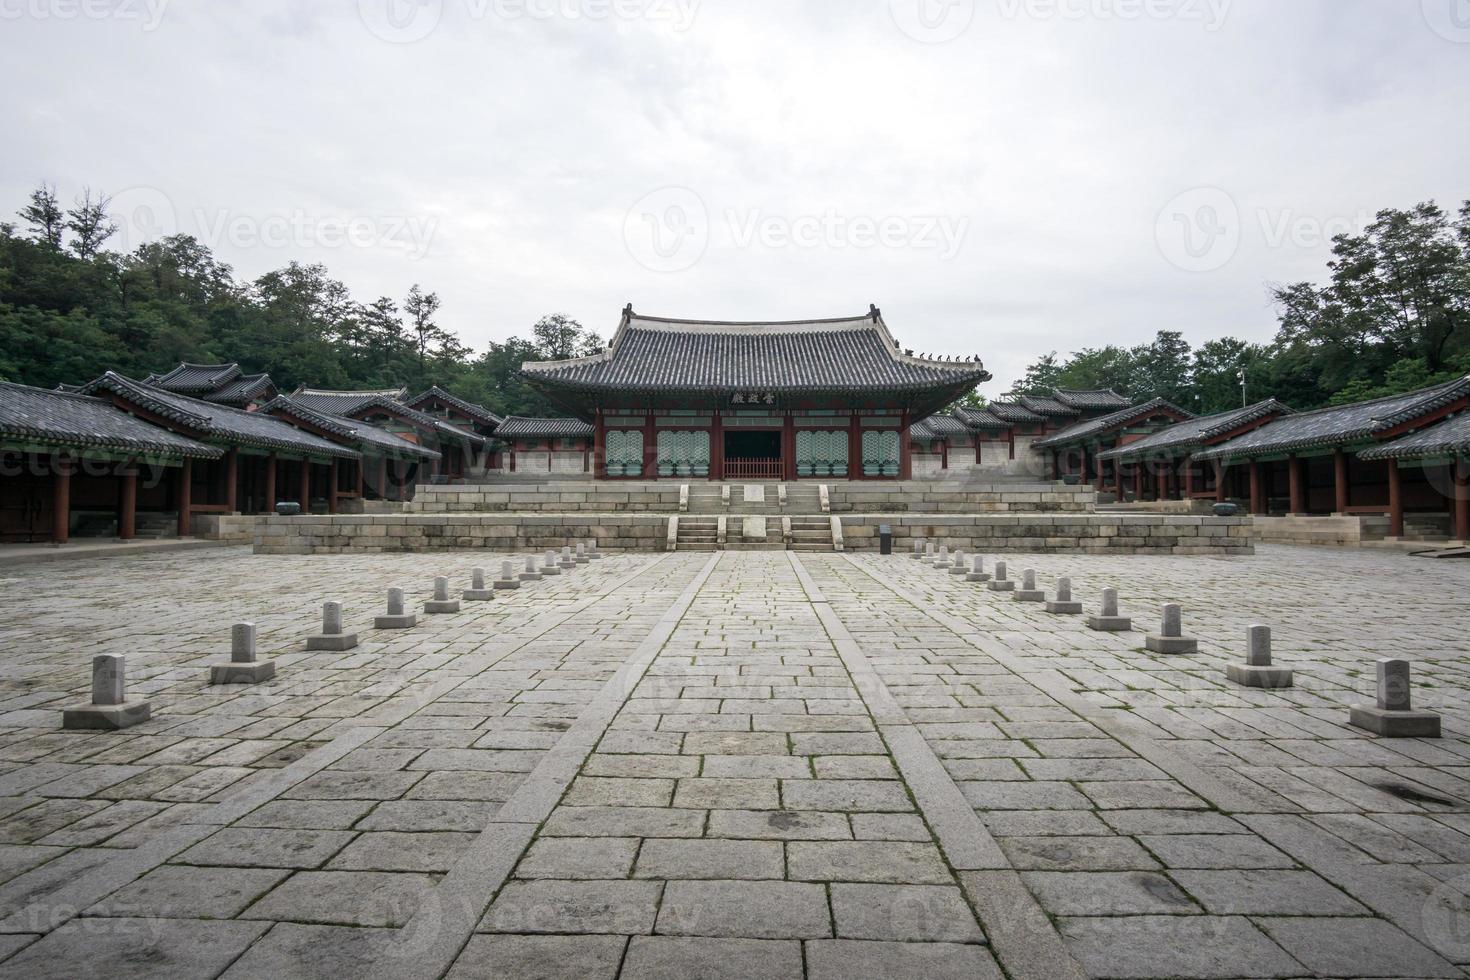 gyeonghui gung paleis landschap foto